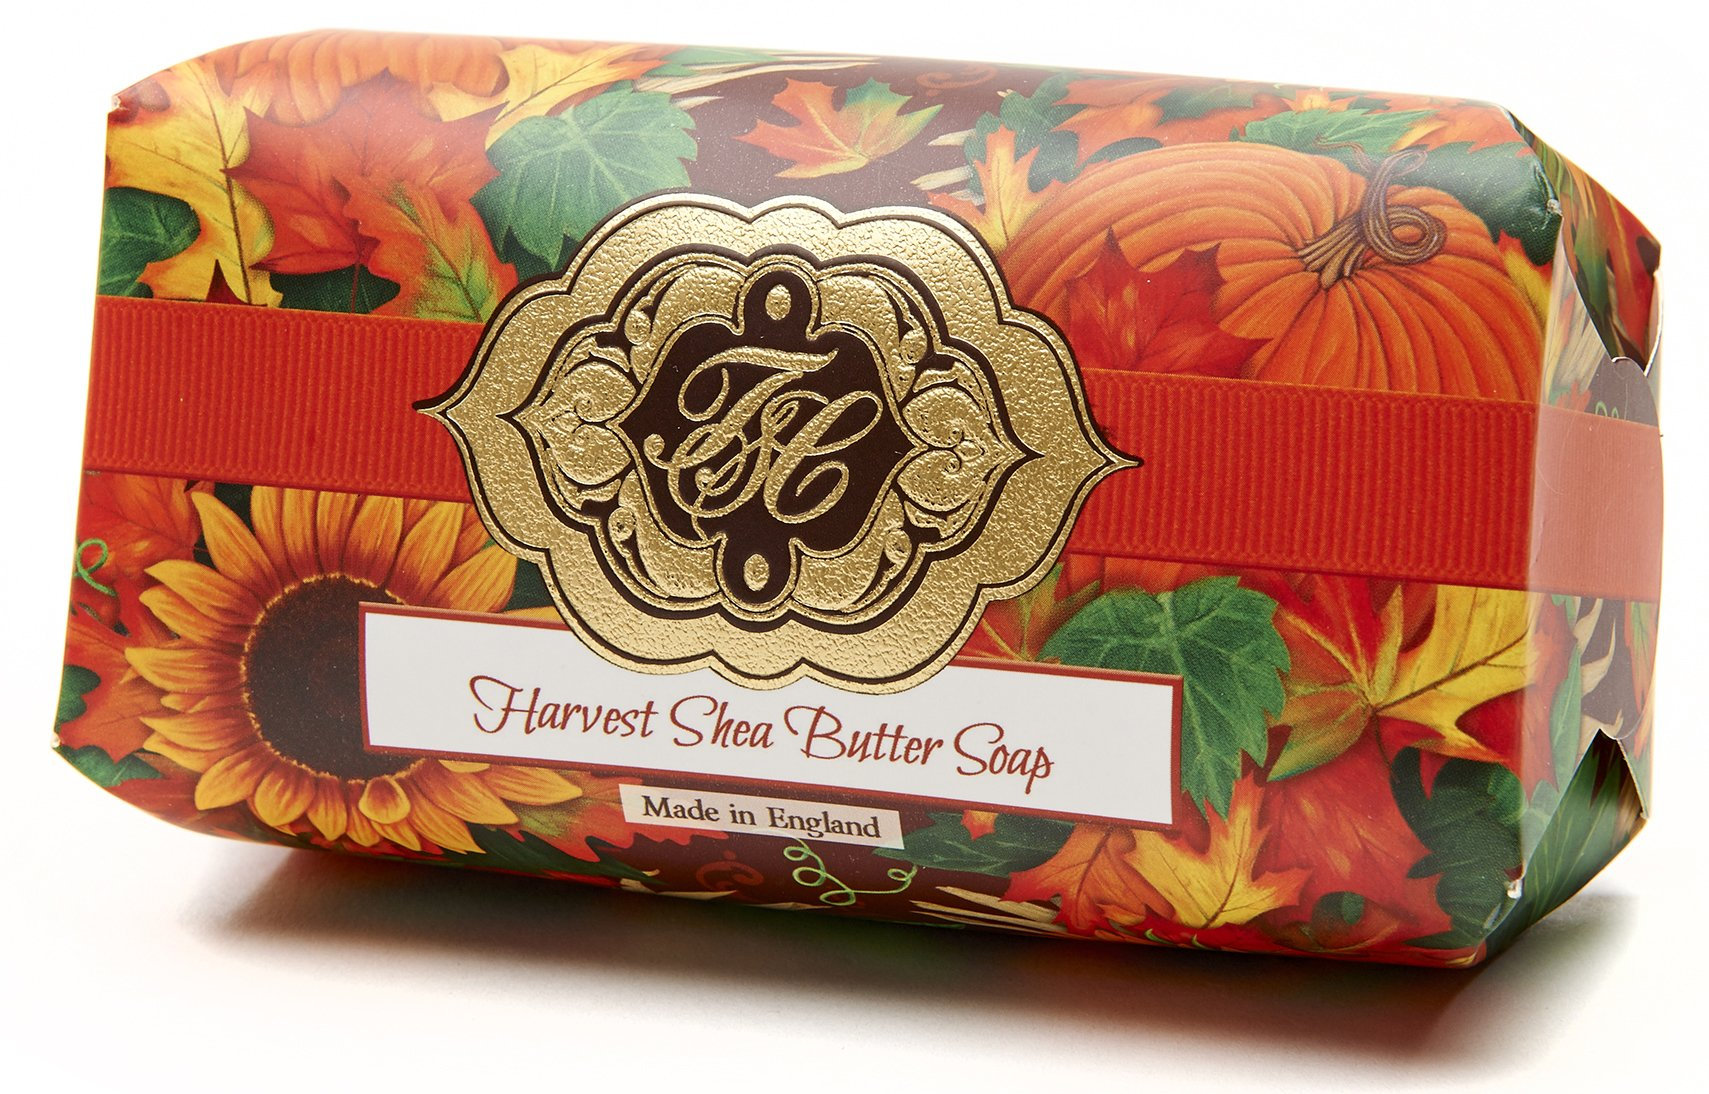 Bath & Body Health & Beauty English Rose & Vanilla Triple Milled Soap